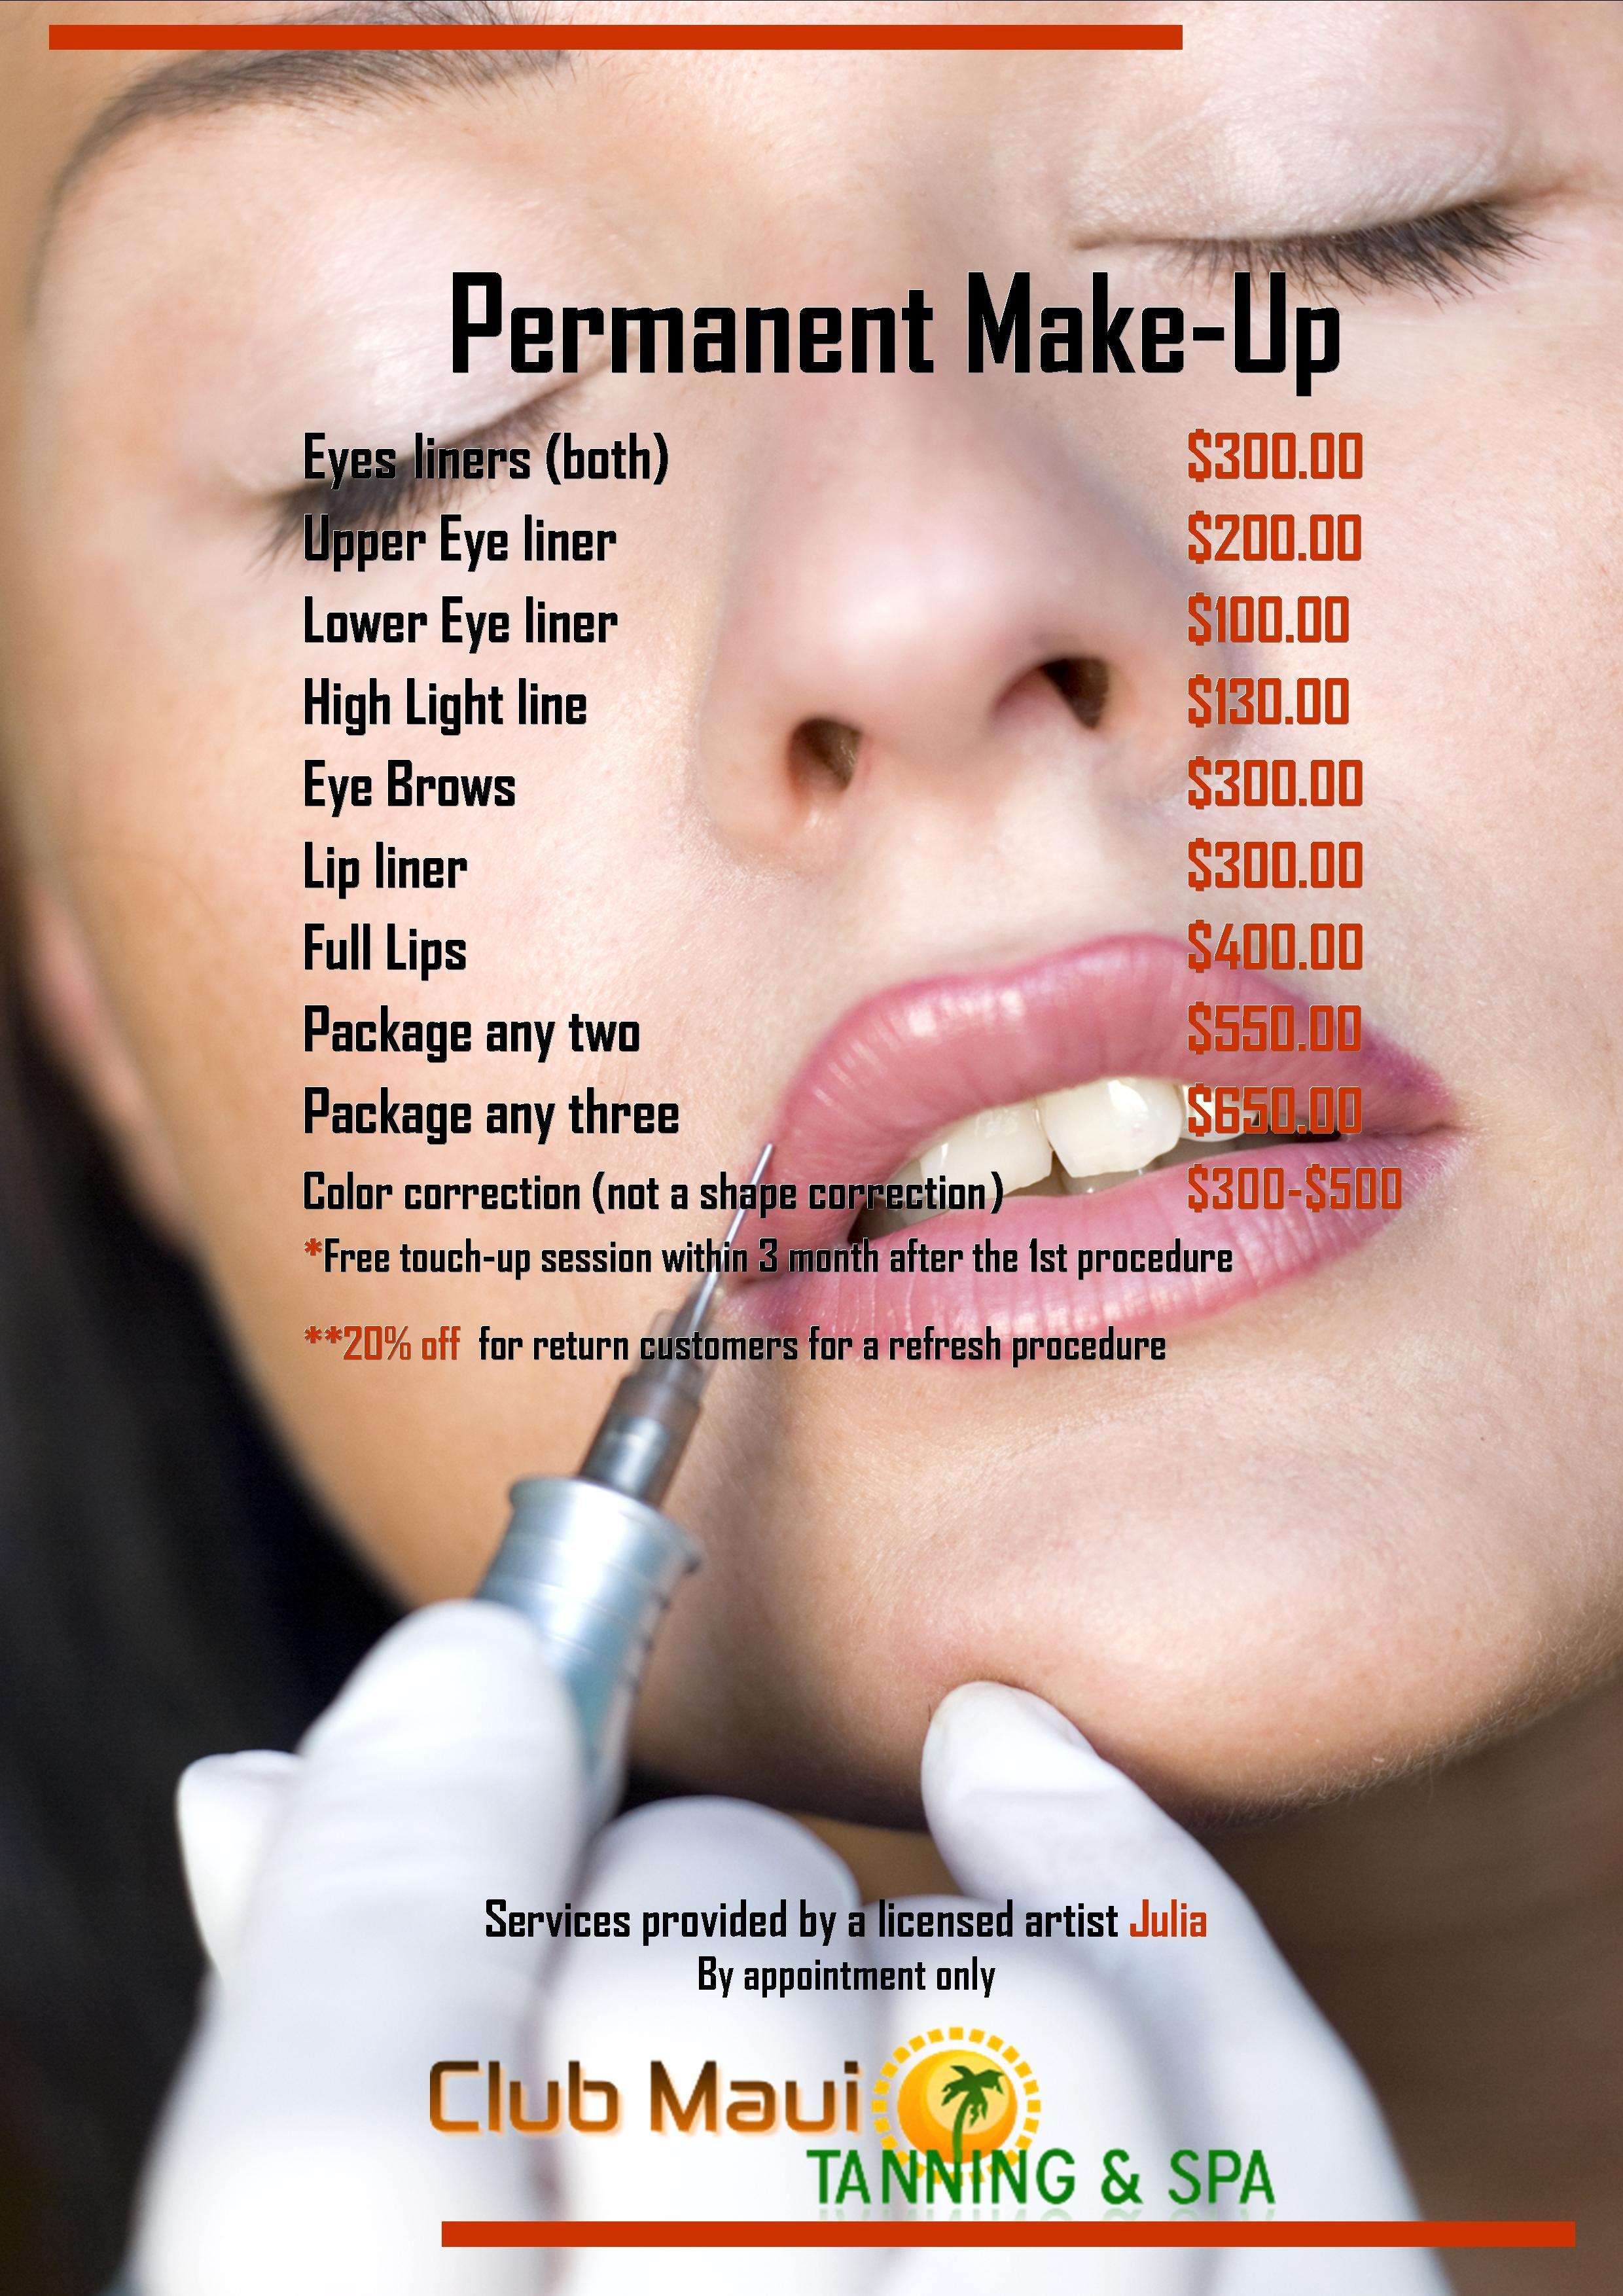 Club Maui Tanning & Spa Permanent Makeup price list